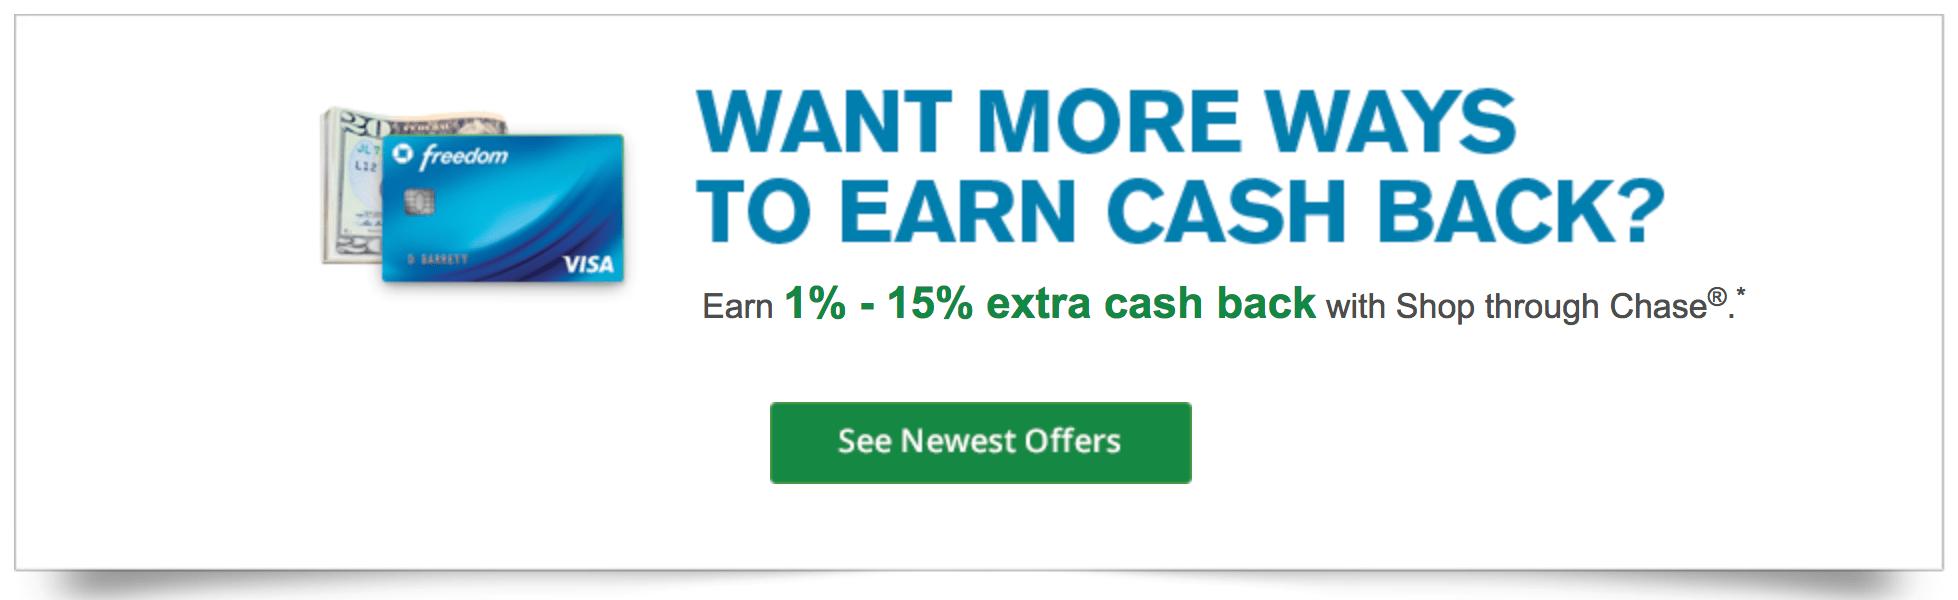 chase rewards shopping portal